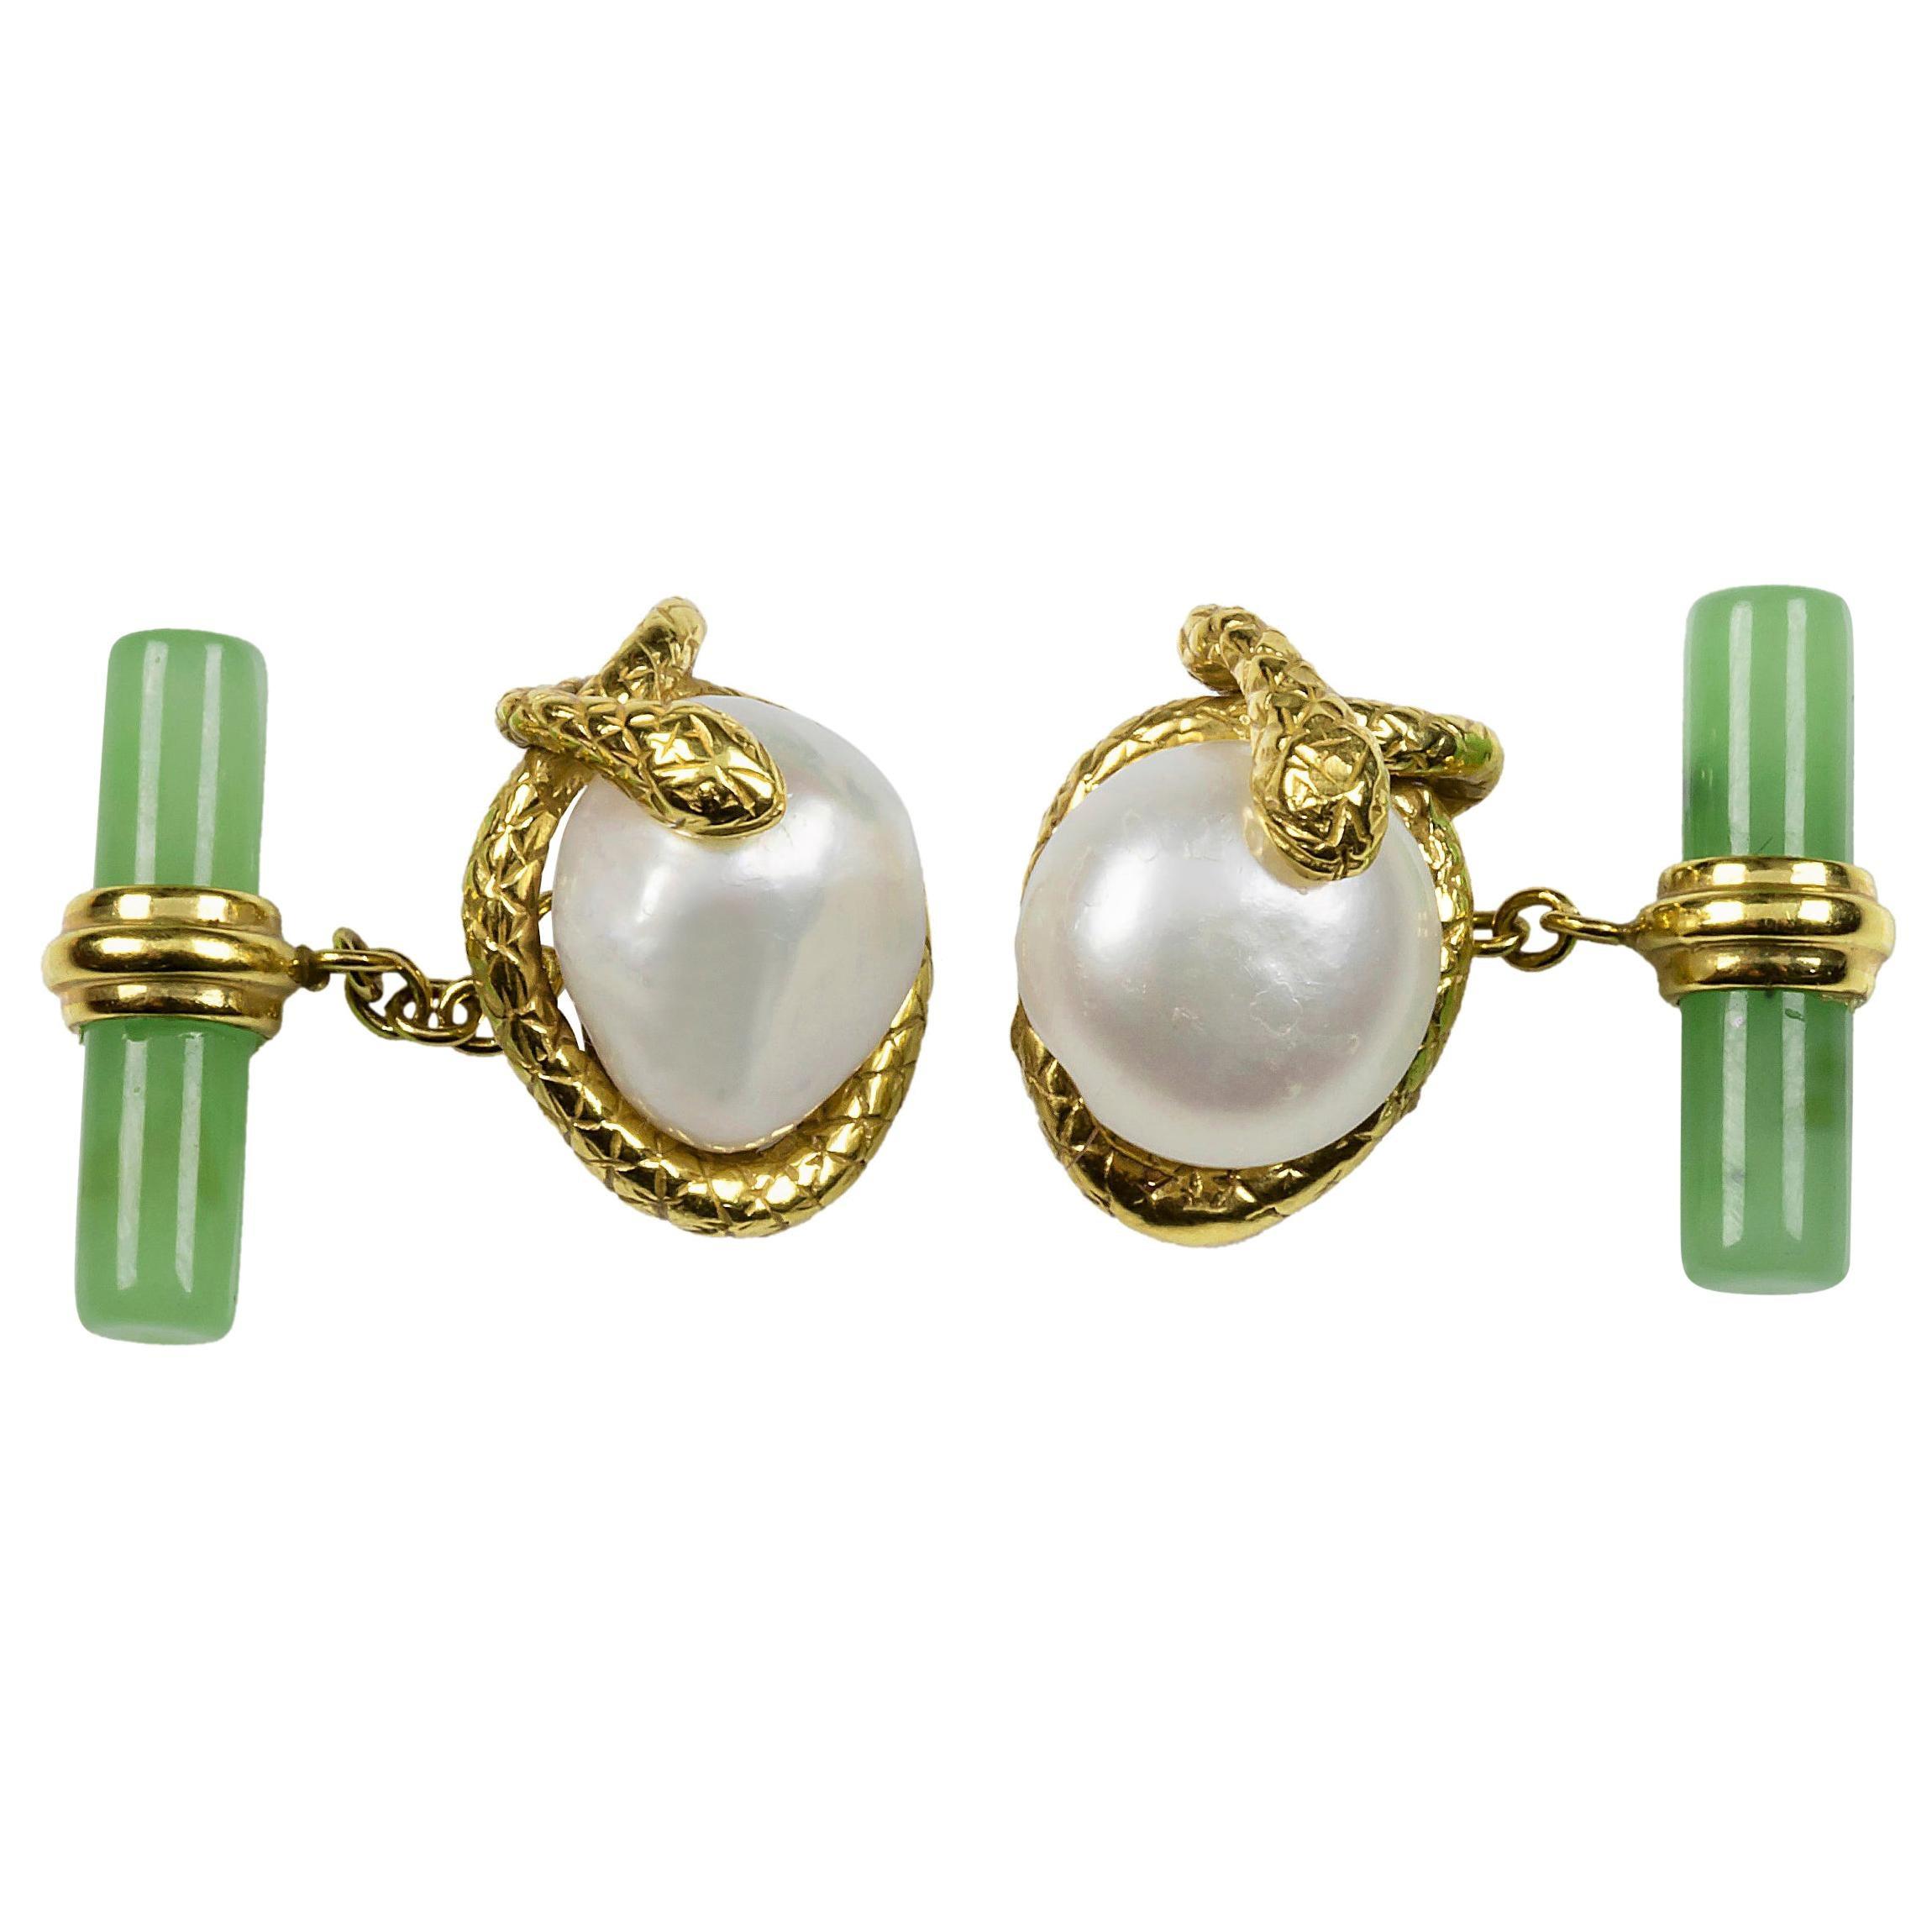 18 Karat Yellow Gold Pearl and Jade Snake Cufflinks